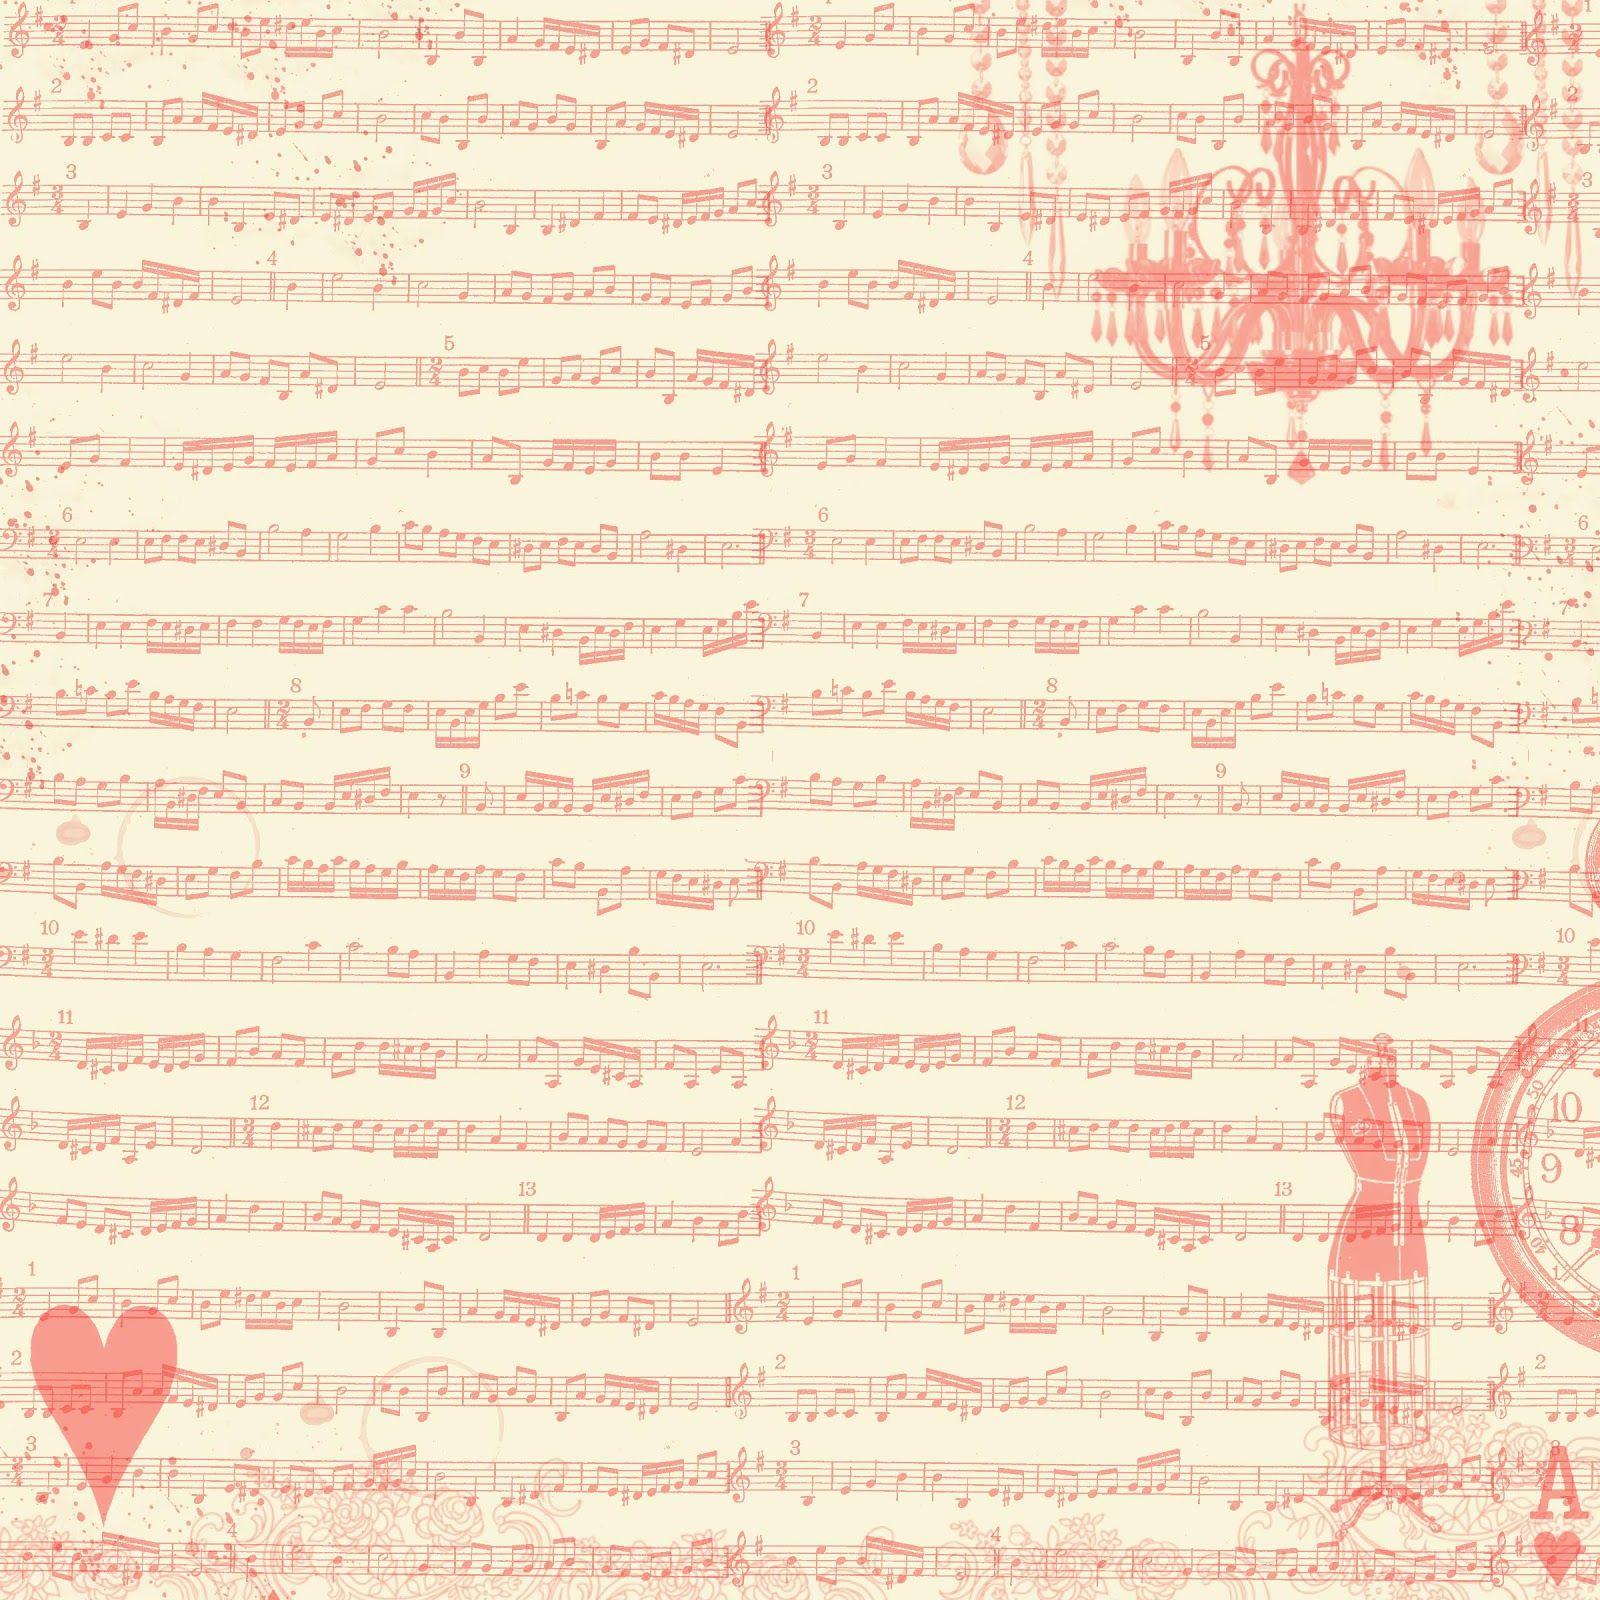 Scrapbook ideas music -  Free Vintage Digital Stamps Free Digital Scrapbook Paper Sheet Music